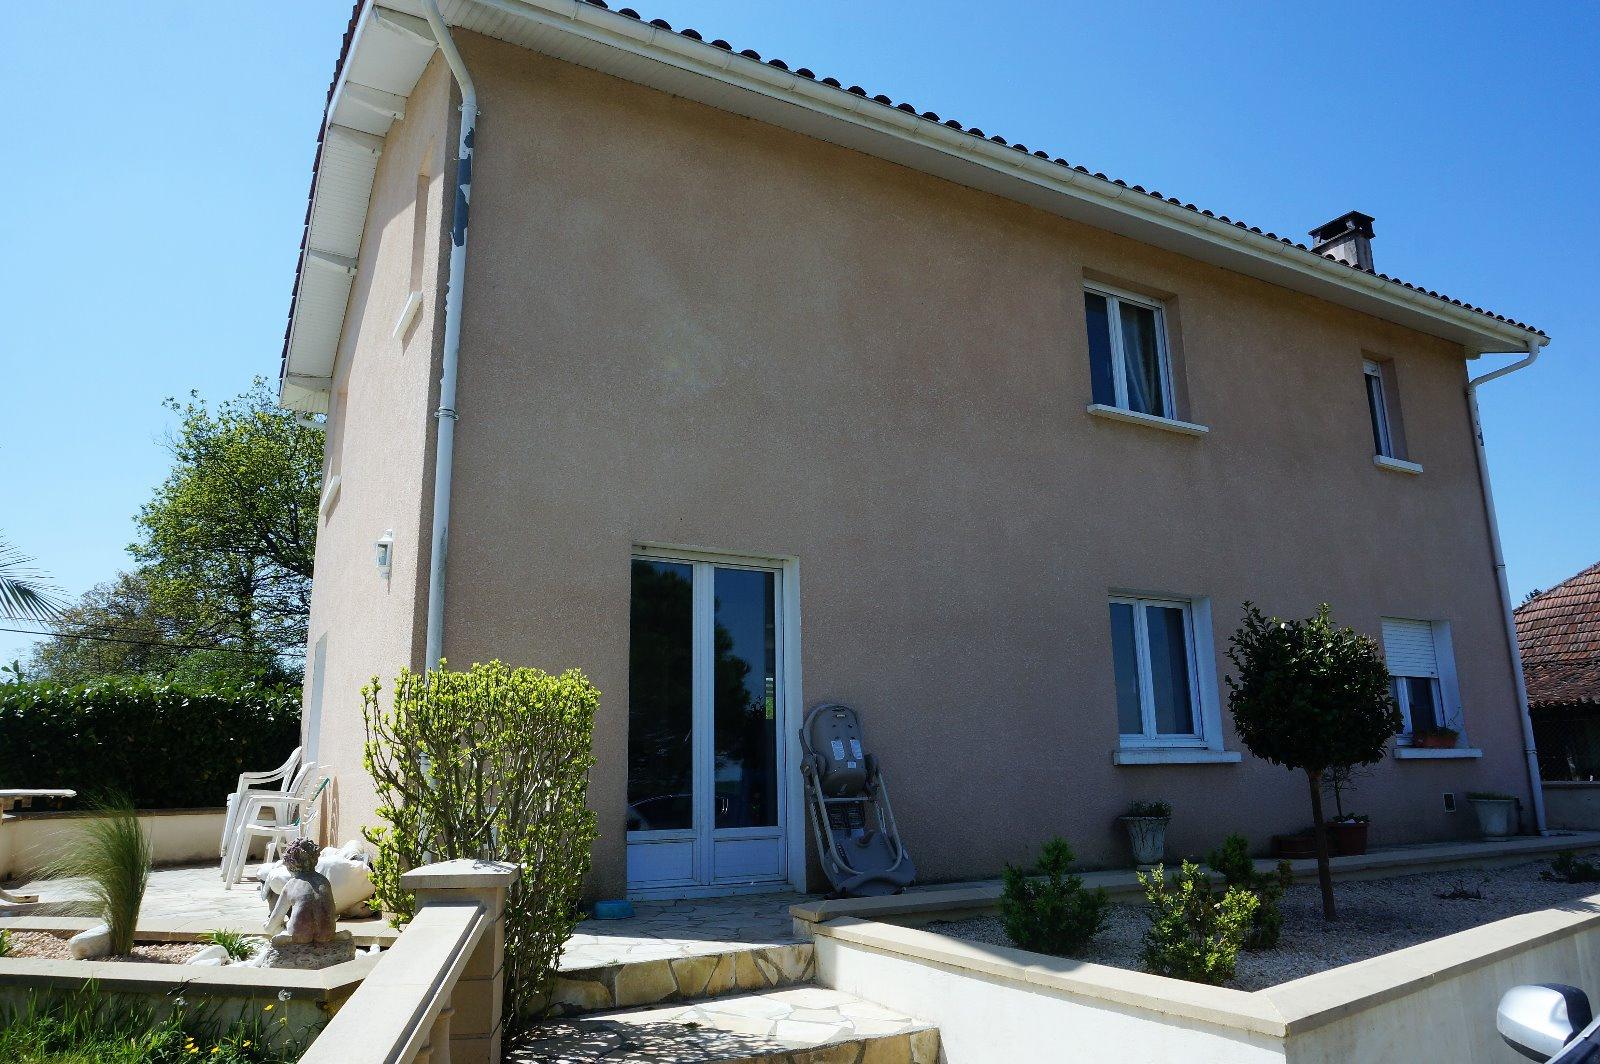 Vente maison/villa 5 pièces garlin 64330